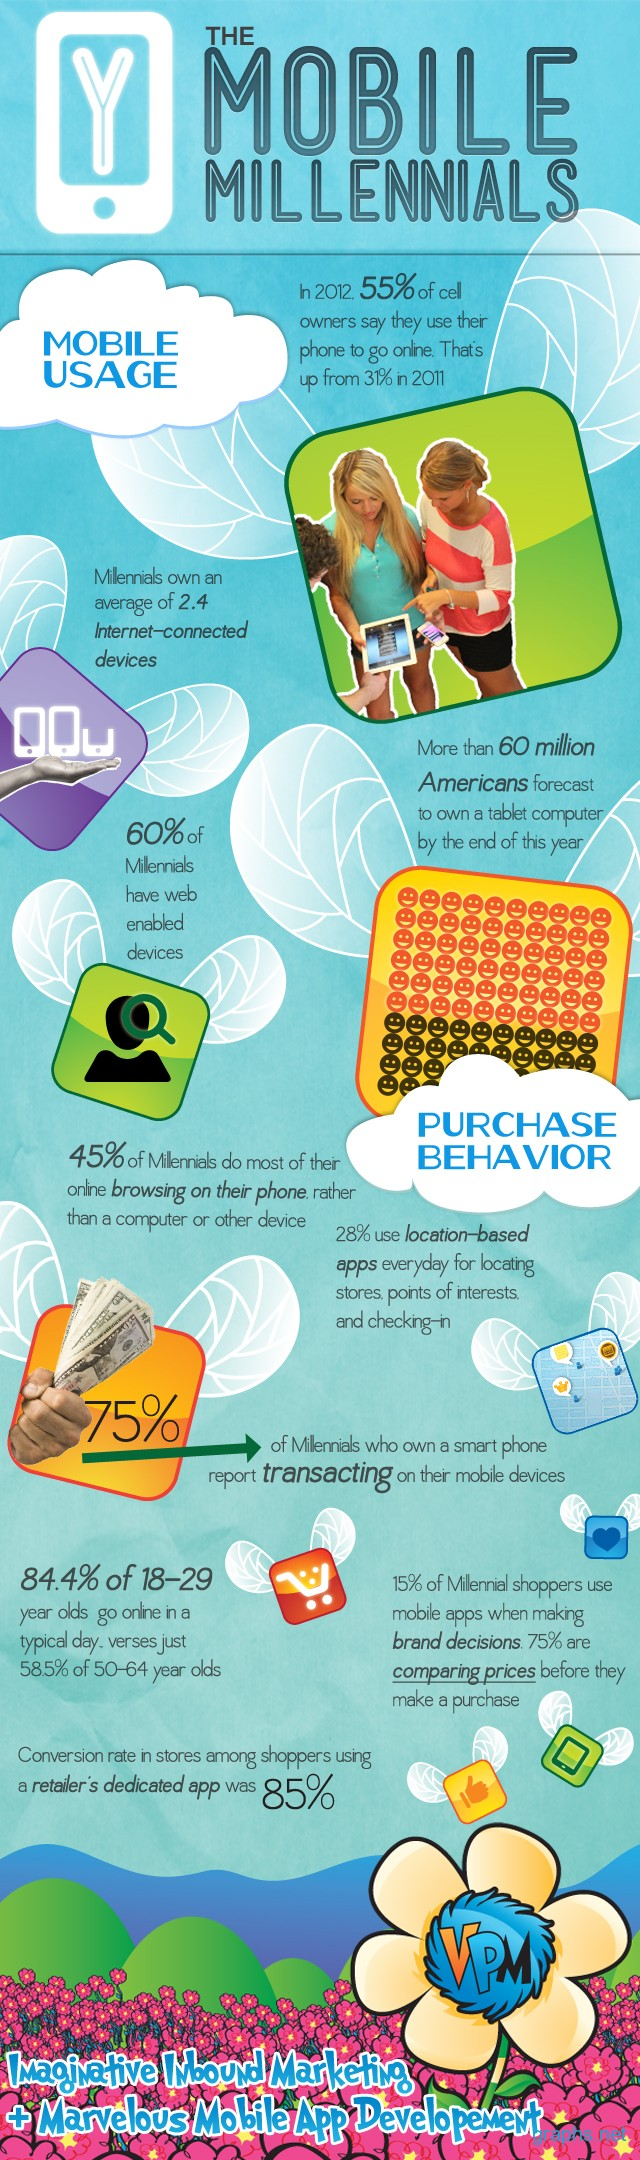 Mobile Usage by Millennials